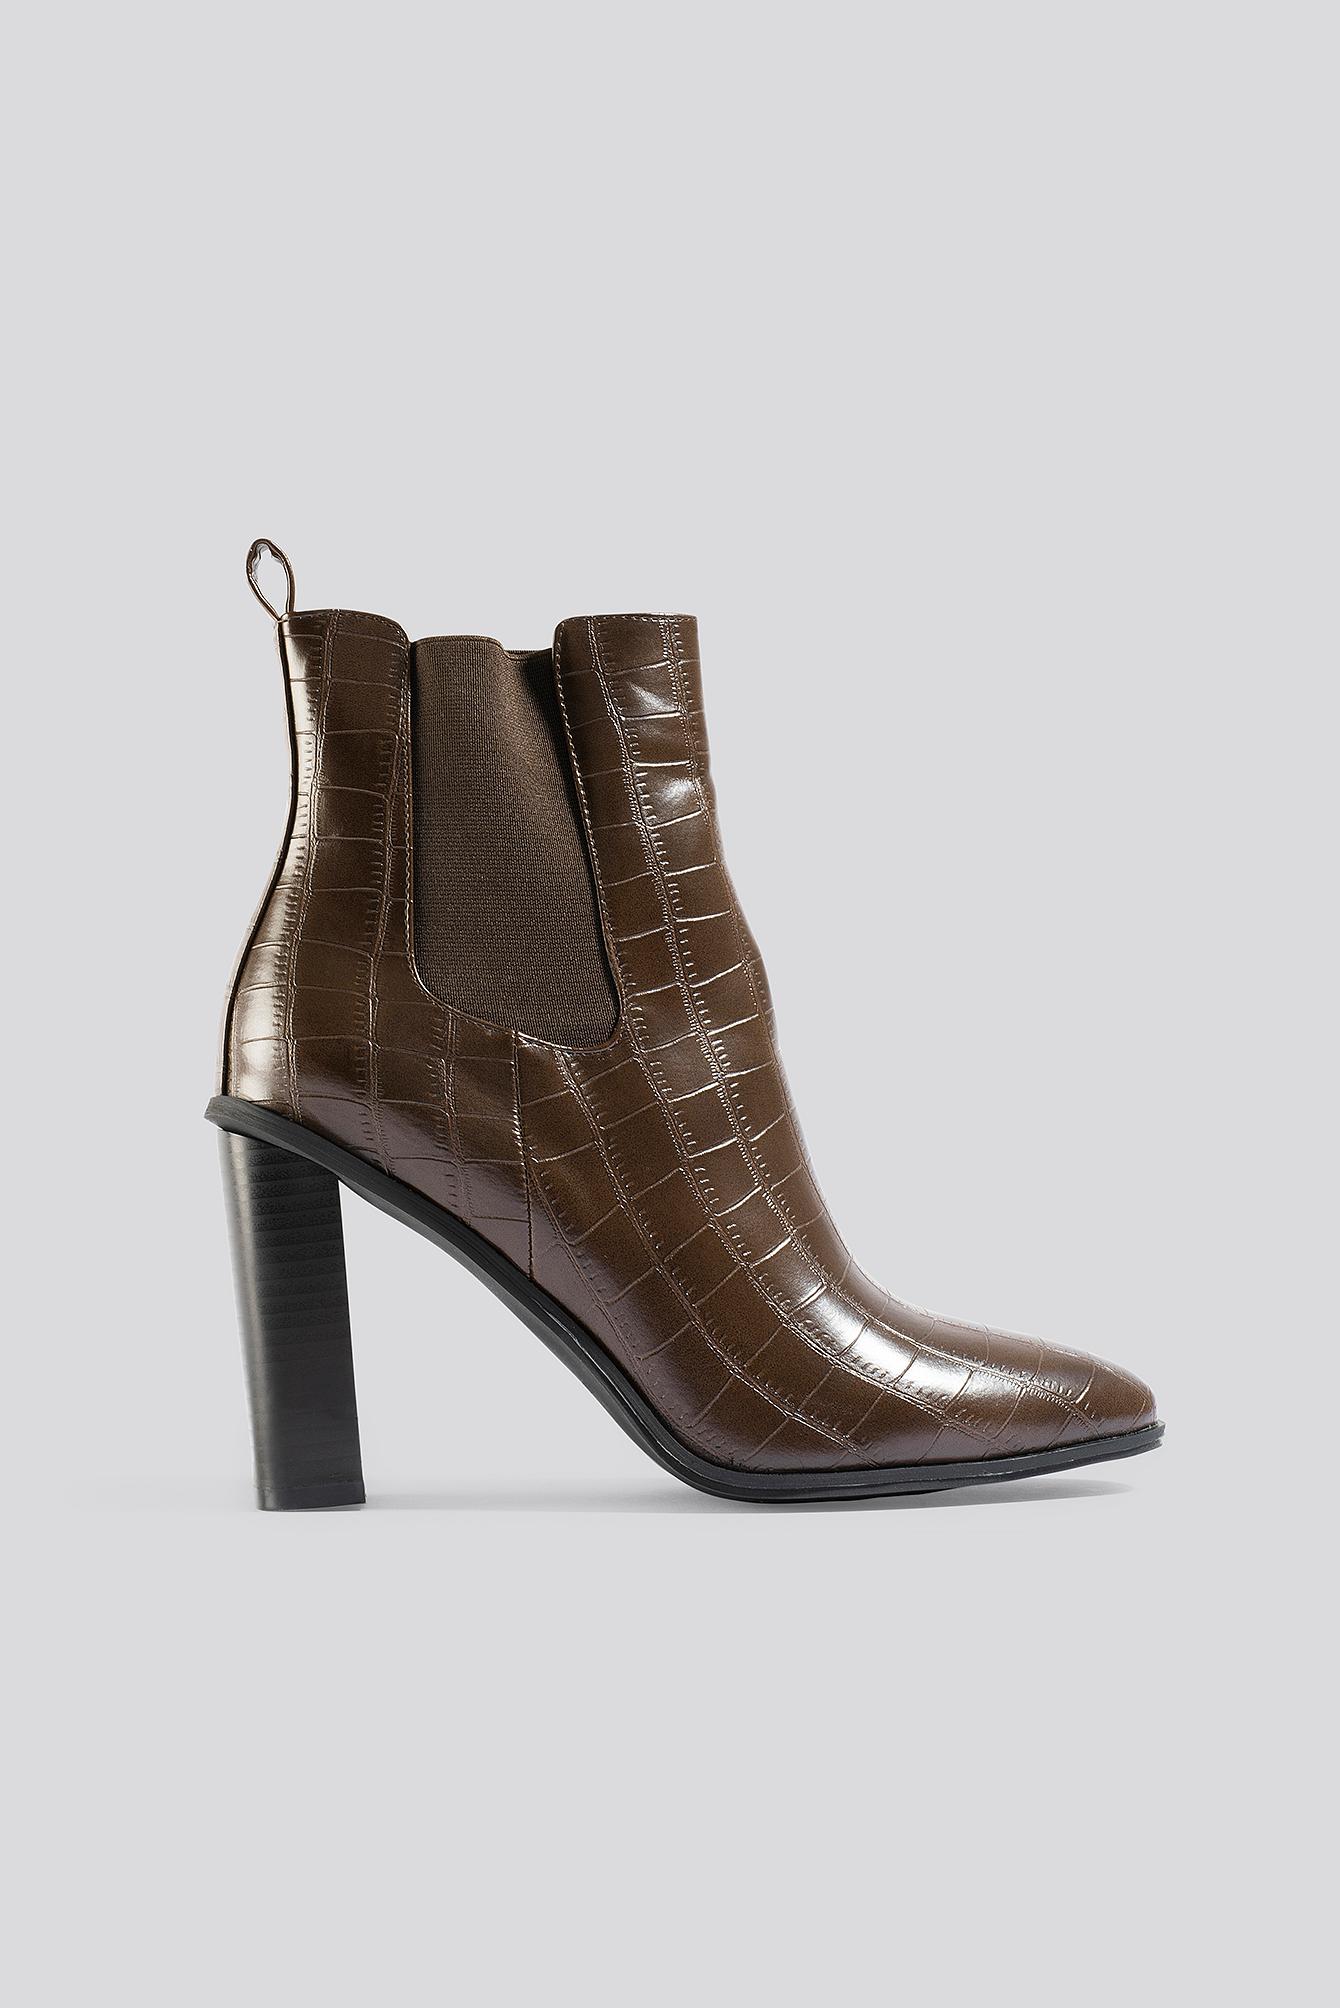 Raid Scarlette Ankle Boots - Brown | Schuhe > Stiefeletten > Ankleboots | Raid